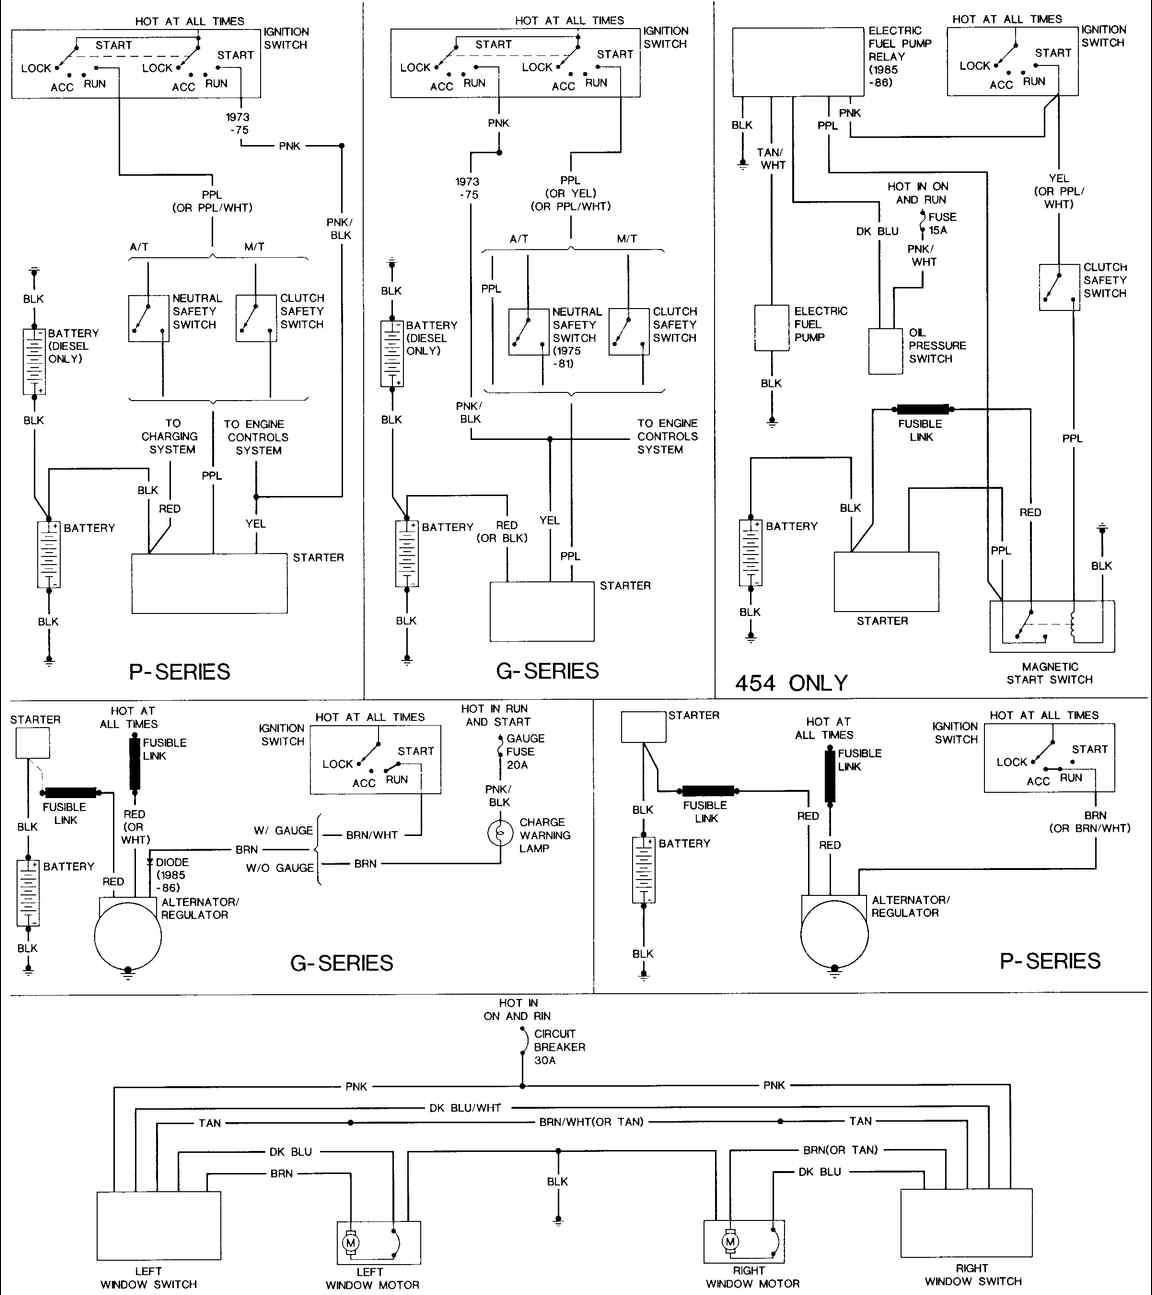 86 Chevy Steering Column Wiring Diagram | Wiring Library - Chevy Tilt Steering Column Wiring Diagram